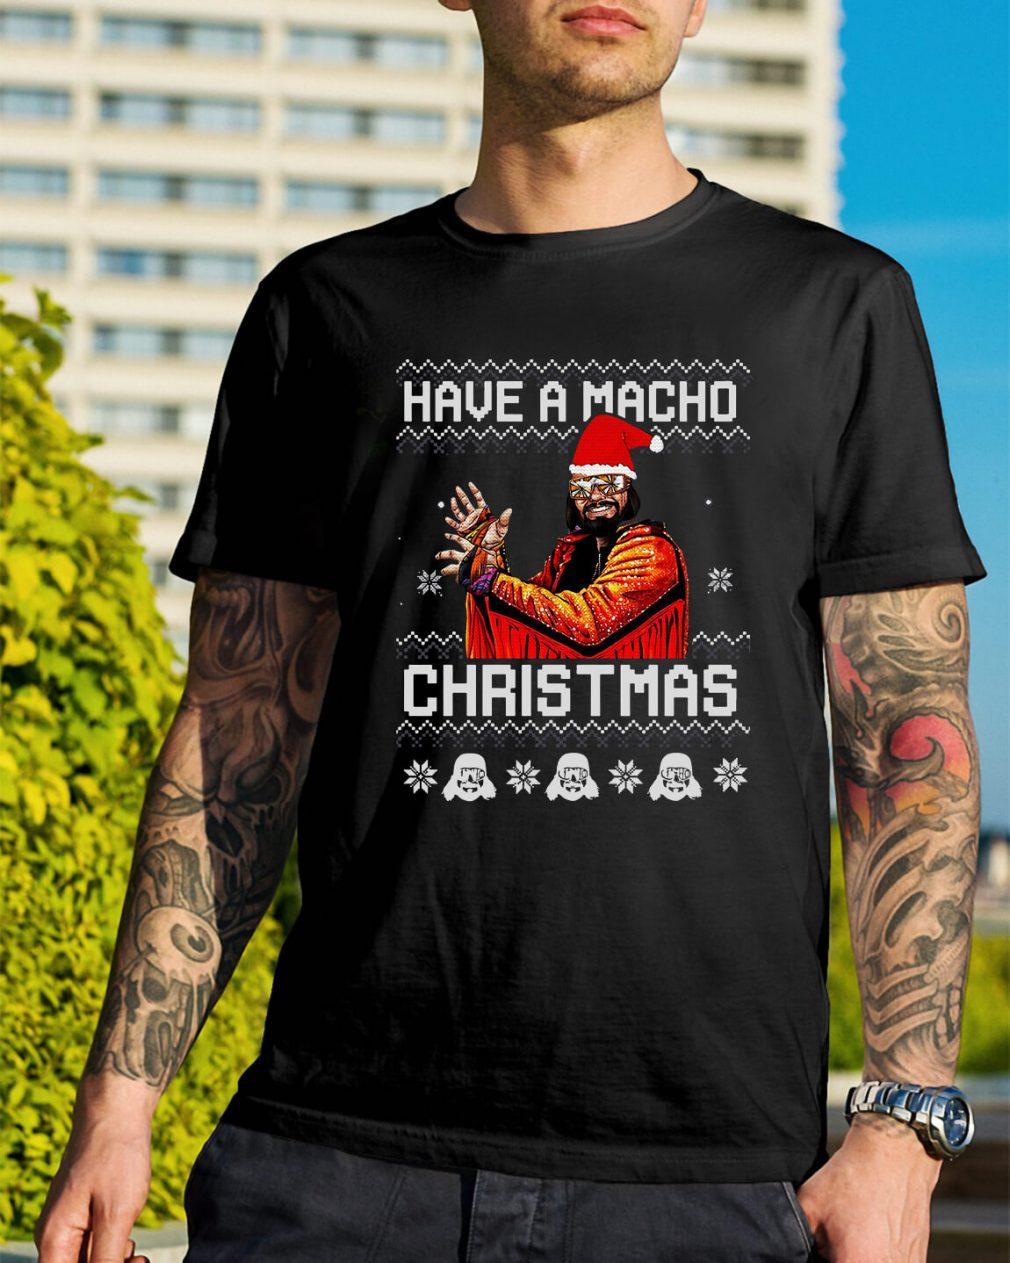 Have a Macho Christmas ugly Guys Shirt